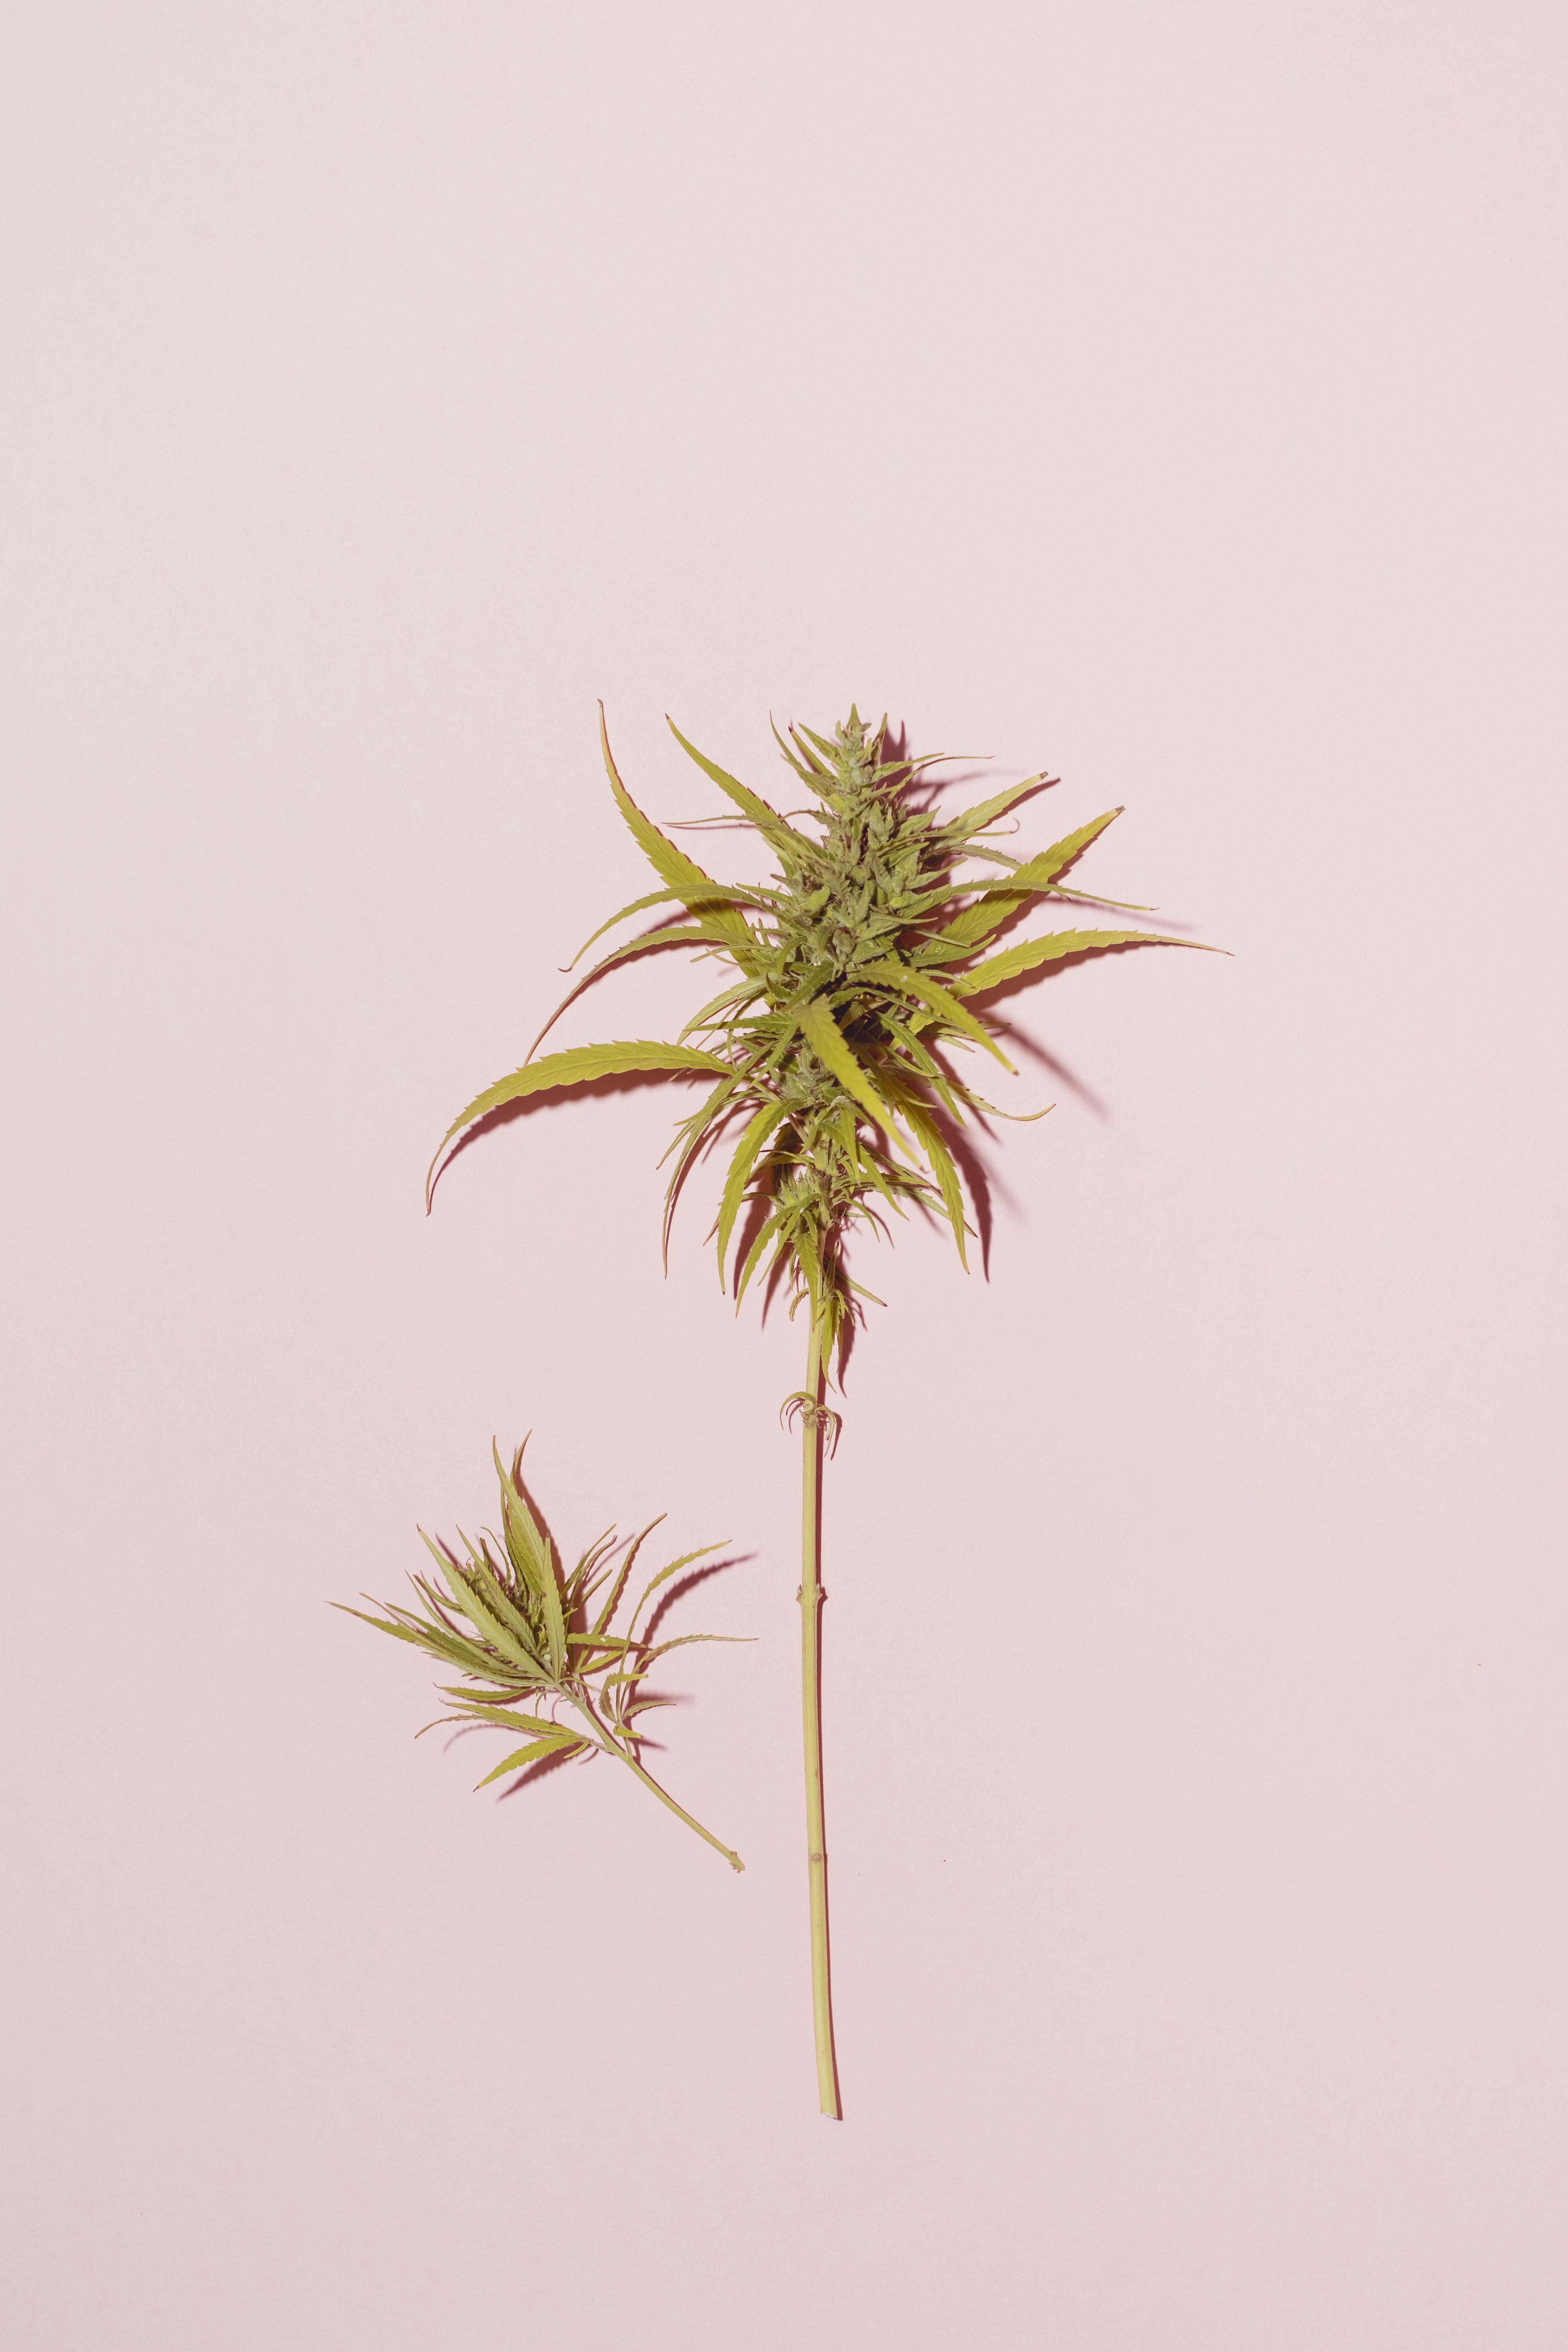 Sephora's Best CBD And Cannabis Beauty